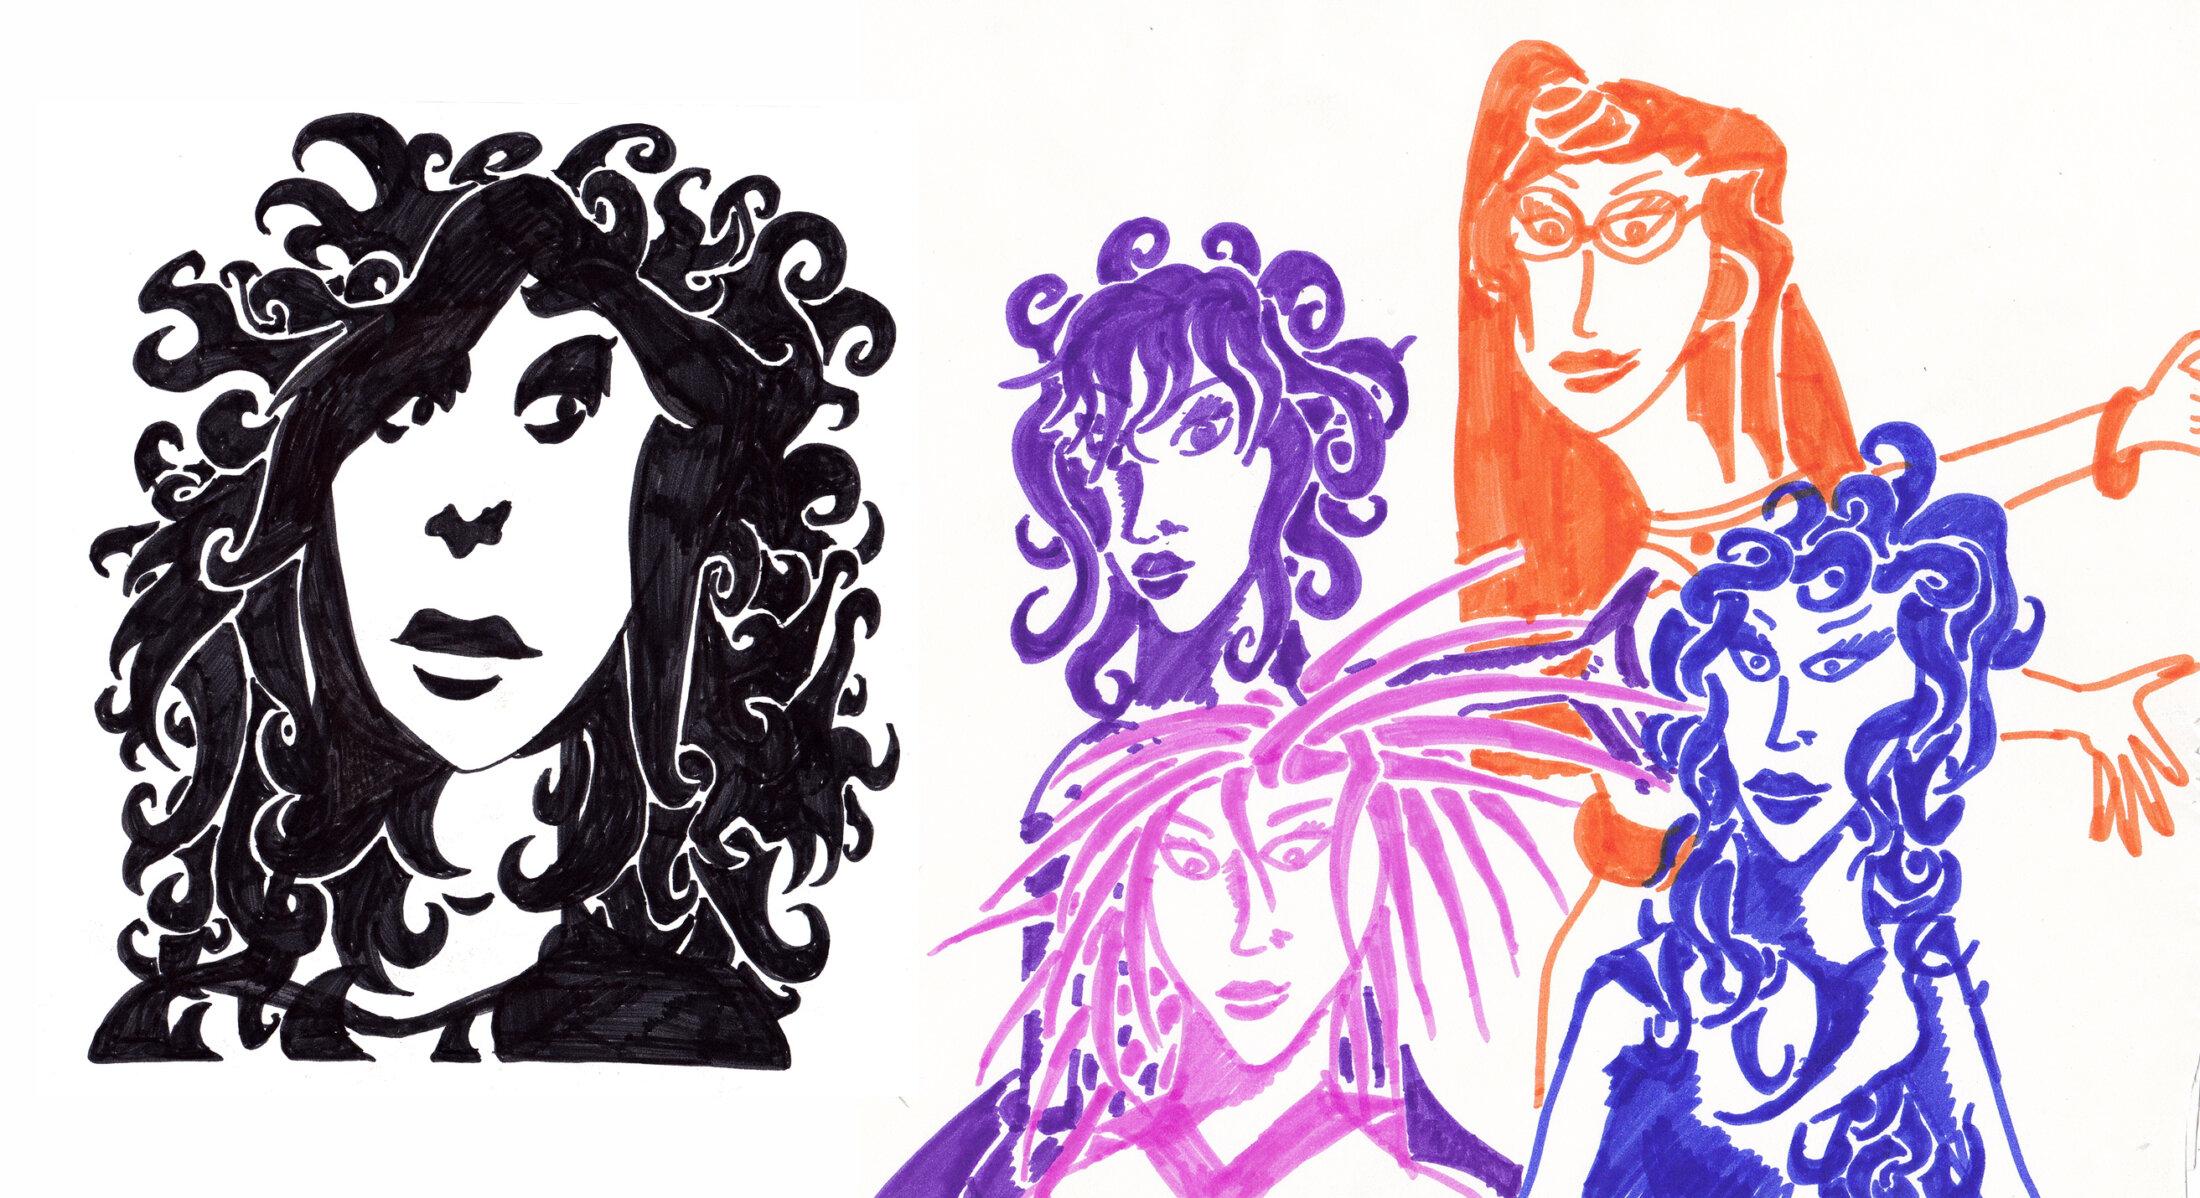 Frauen (1997/98)